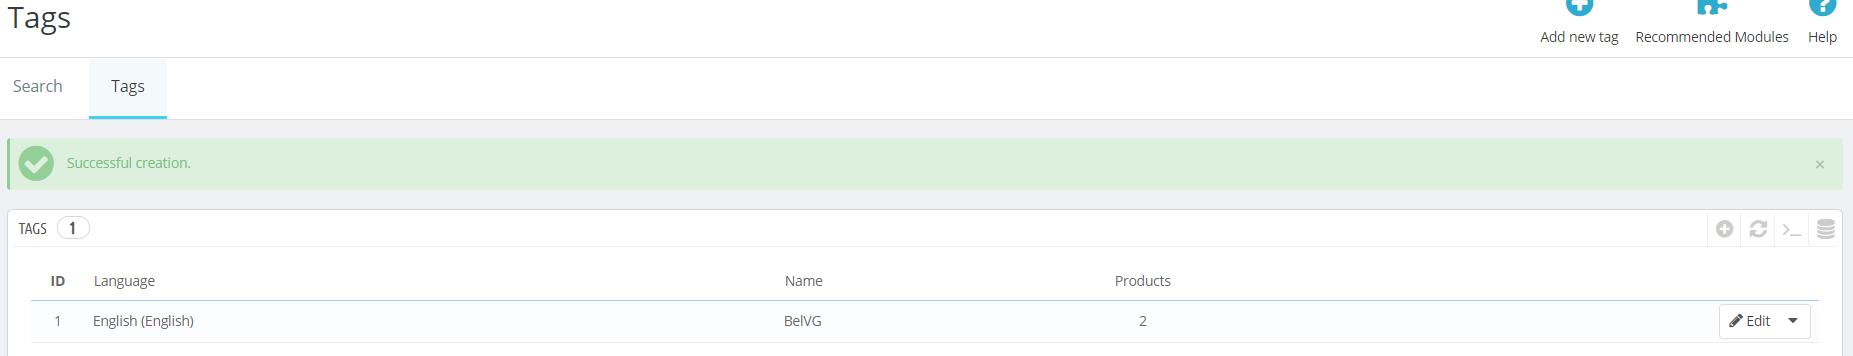 PrestaShop 1.7.5 tags